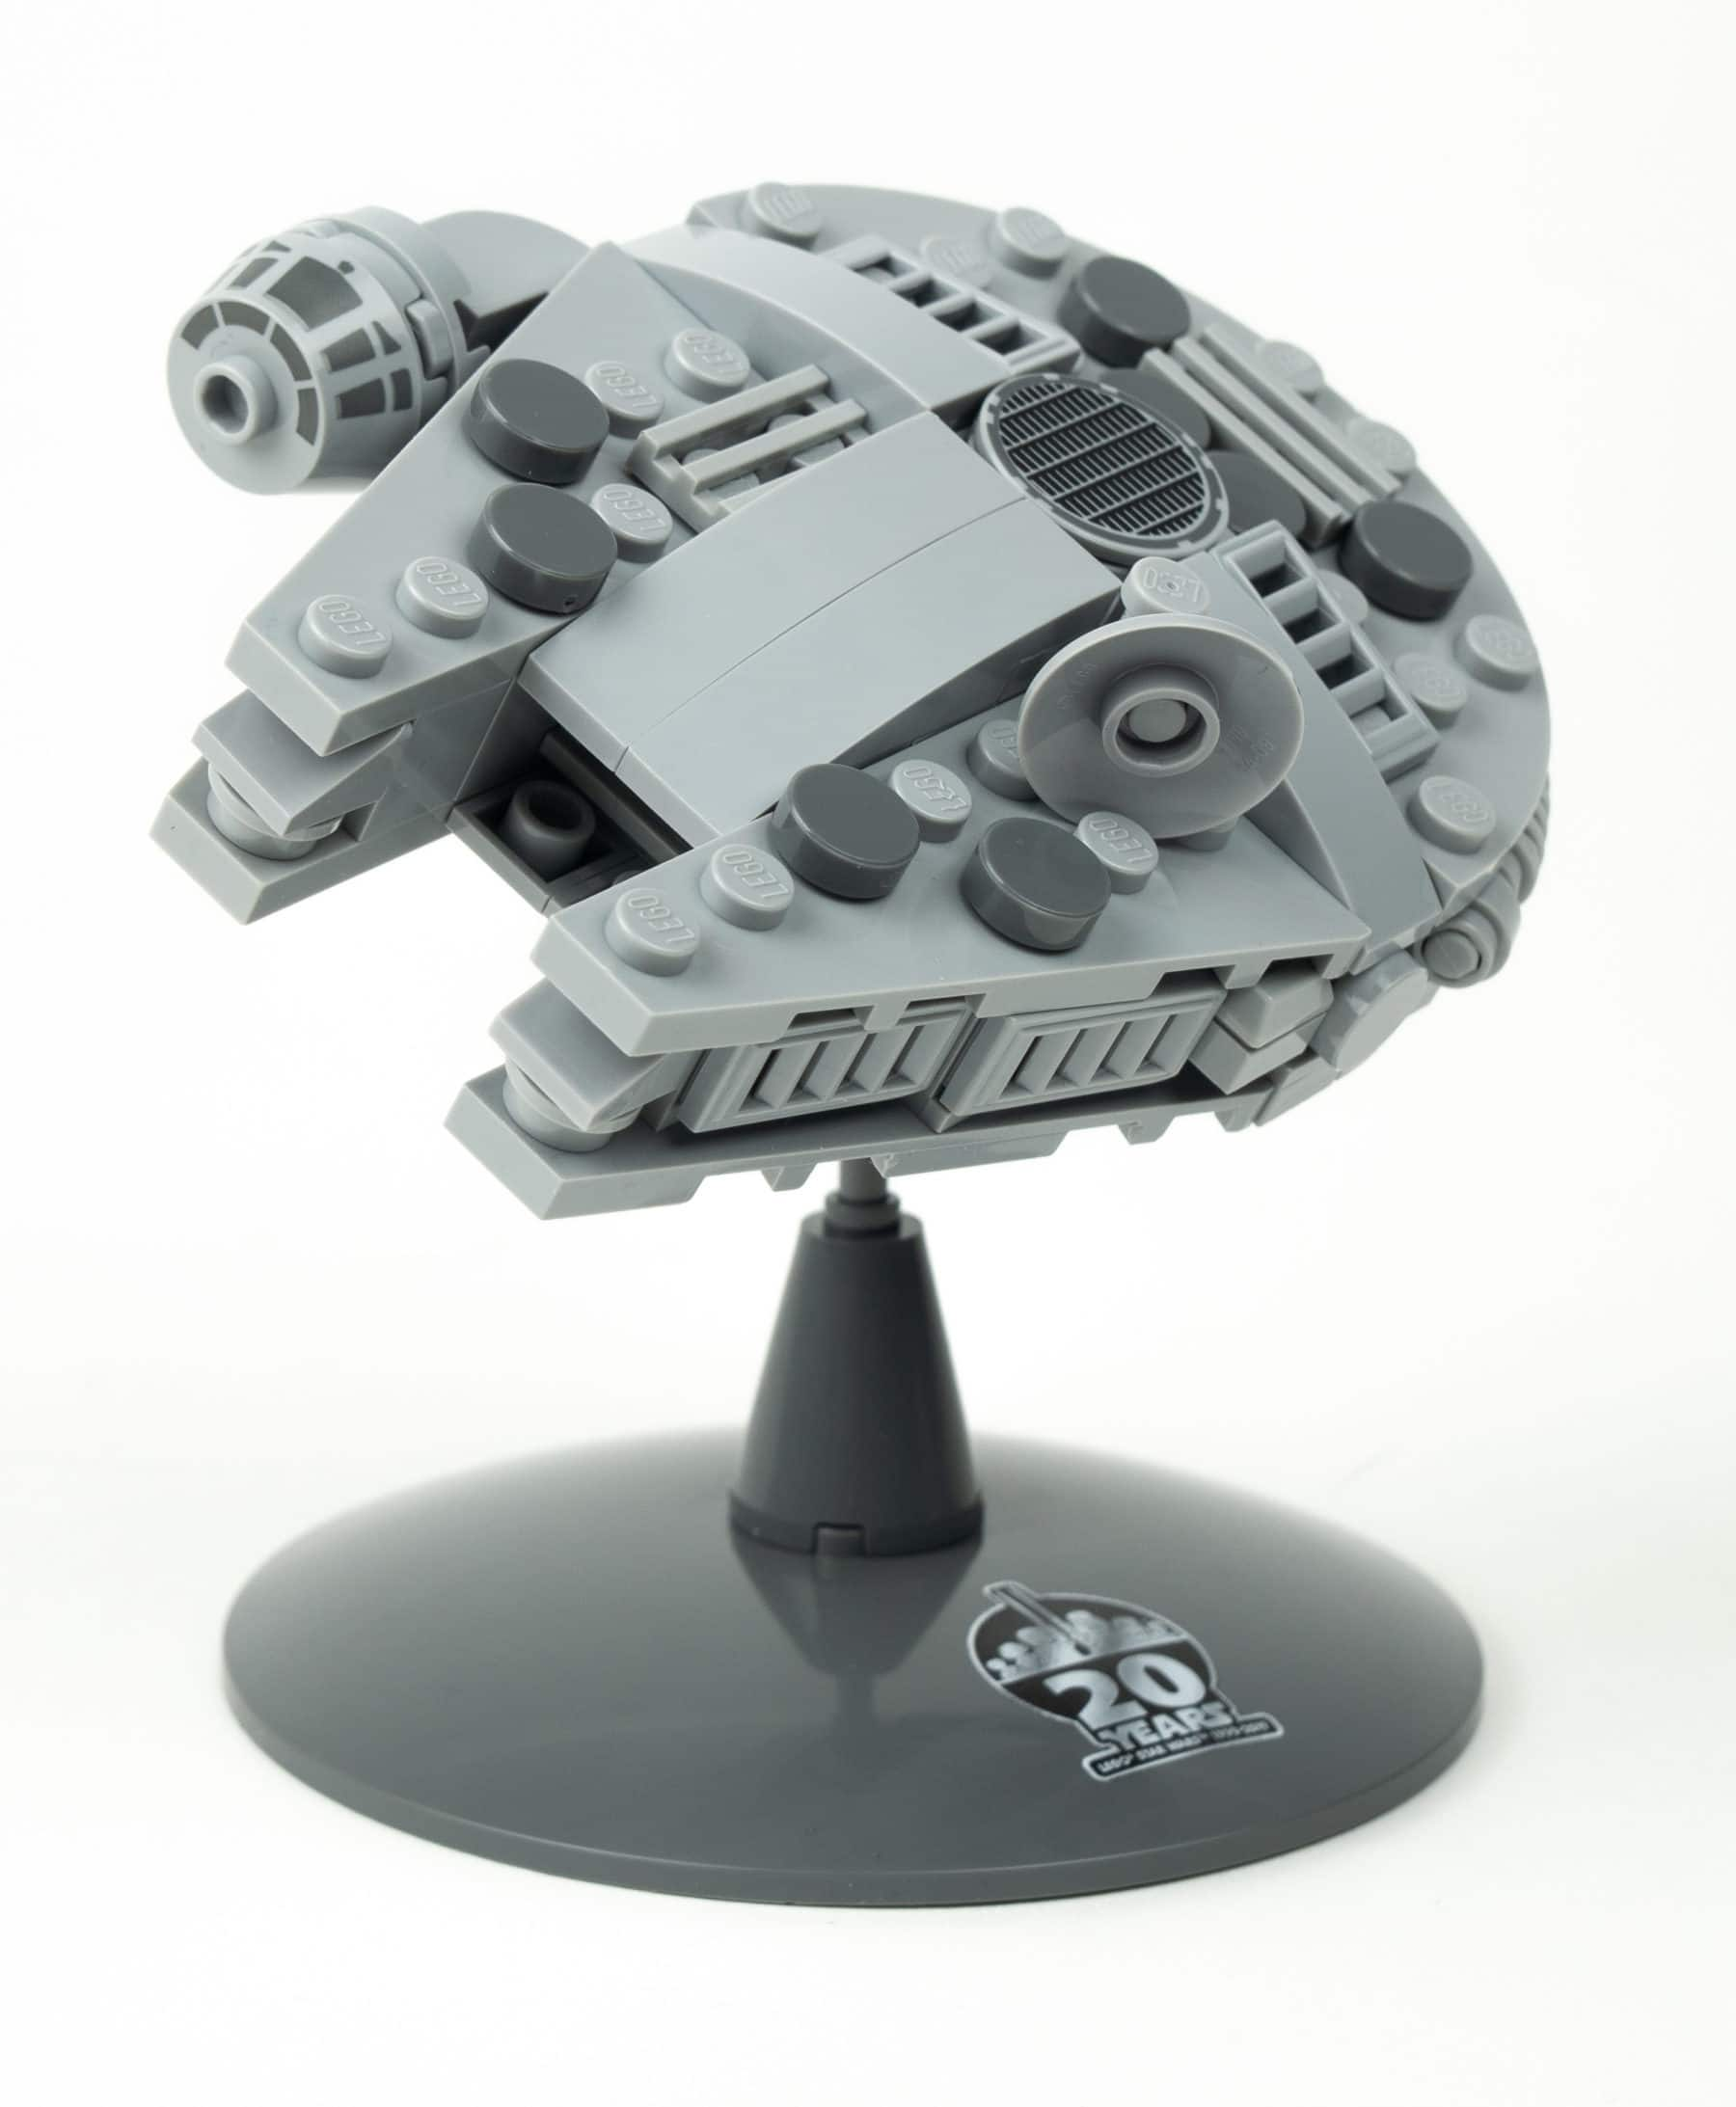 20 Jahre LEGO Star Wars Millennium Falcon